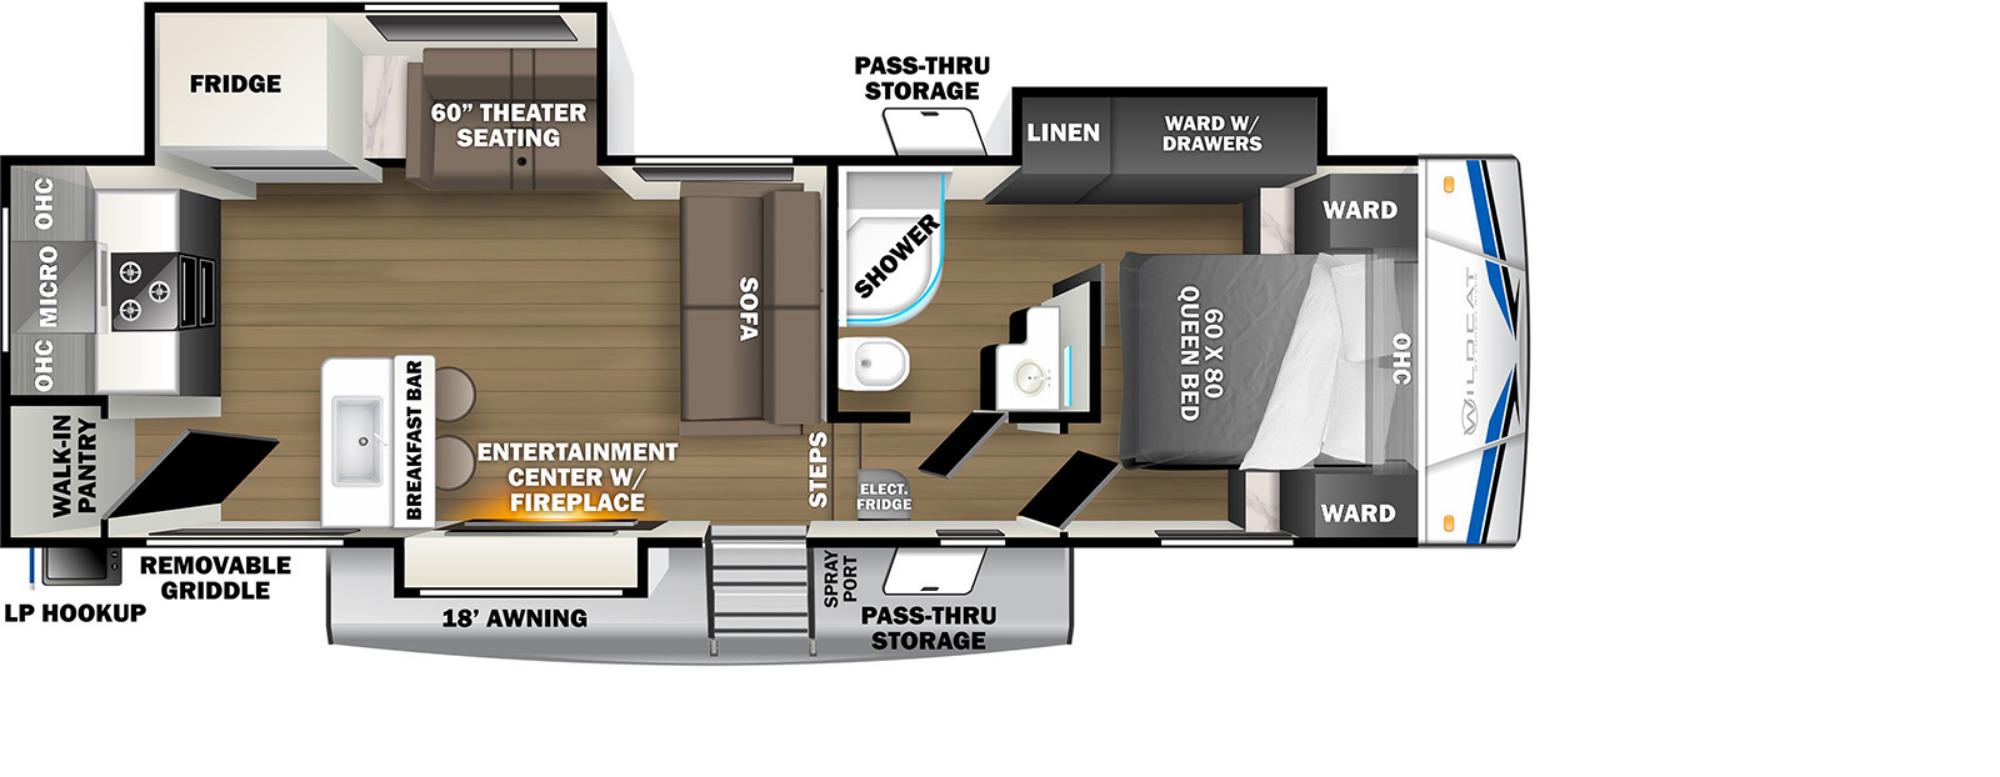 View Floor Plan for 2022 FOREST RIVER WILDCAT 271ML